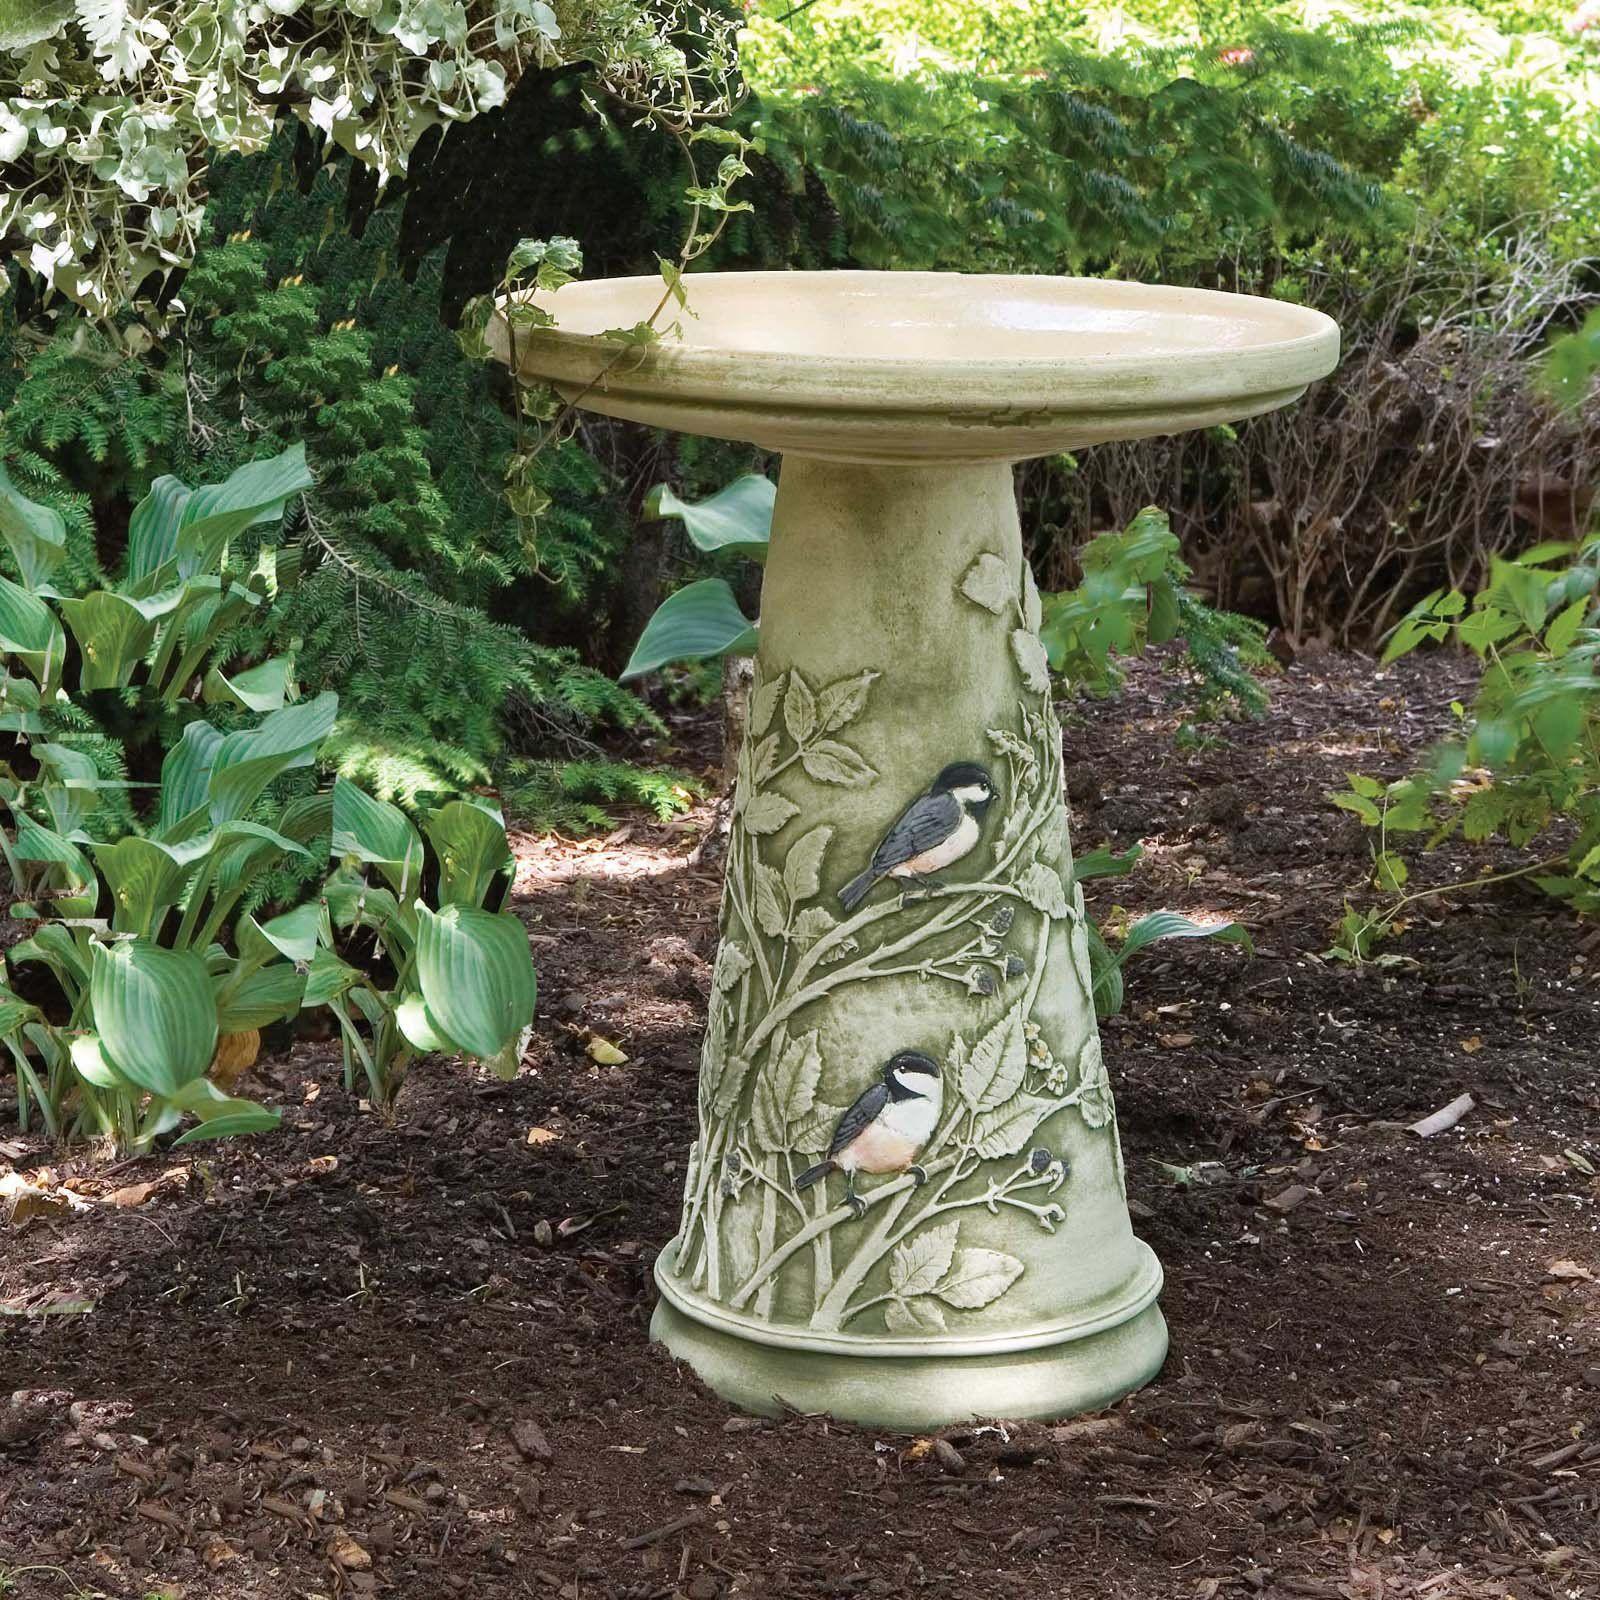 burley clay hand painted chickadee ceramic bird bath from